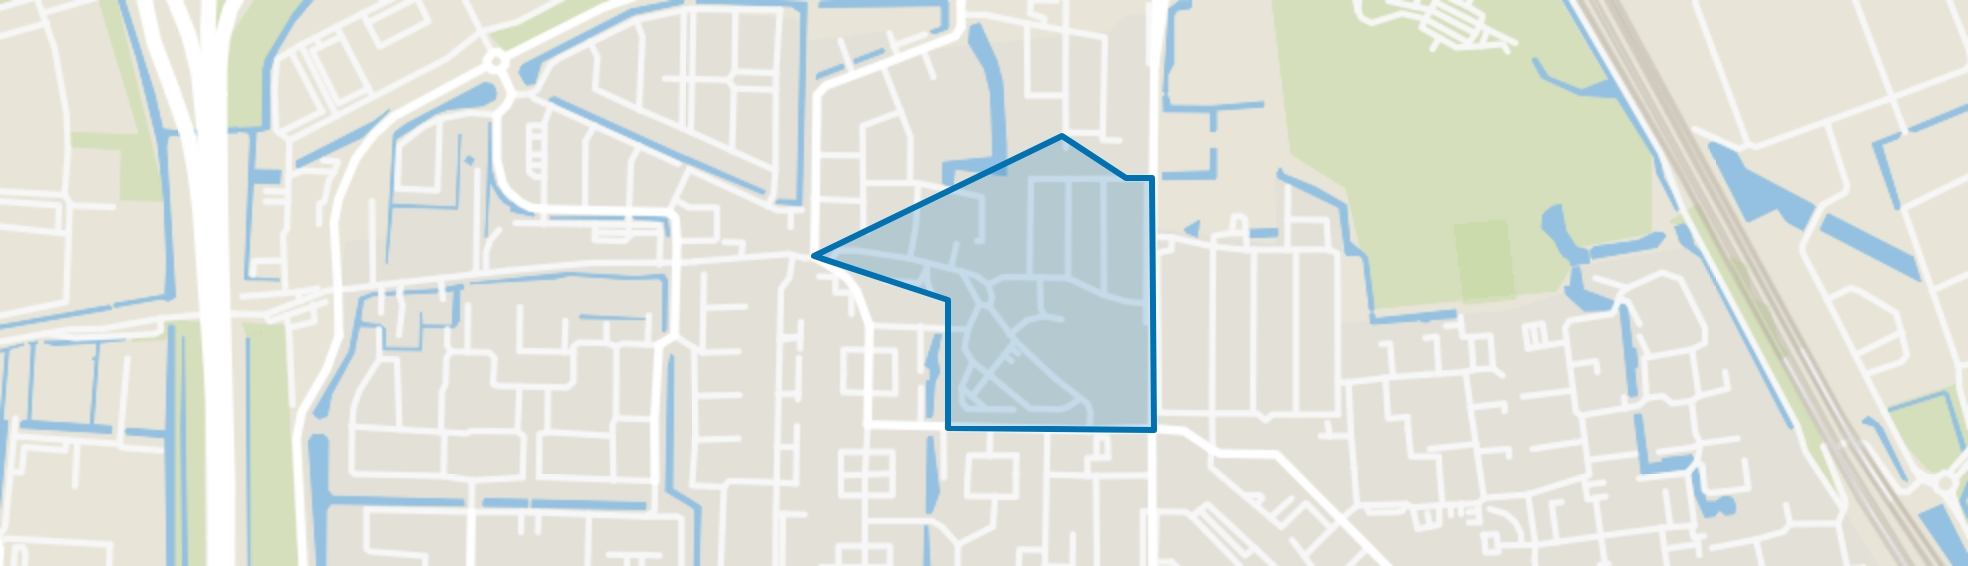 Centrum West, Barendrecht map